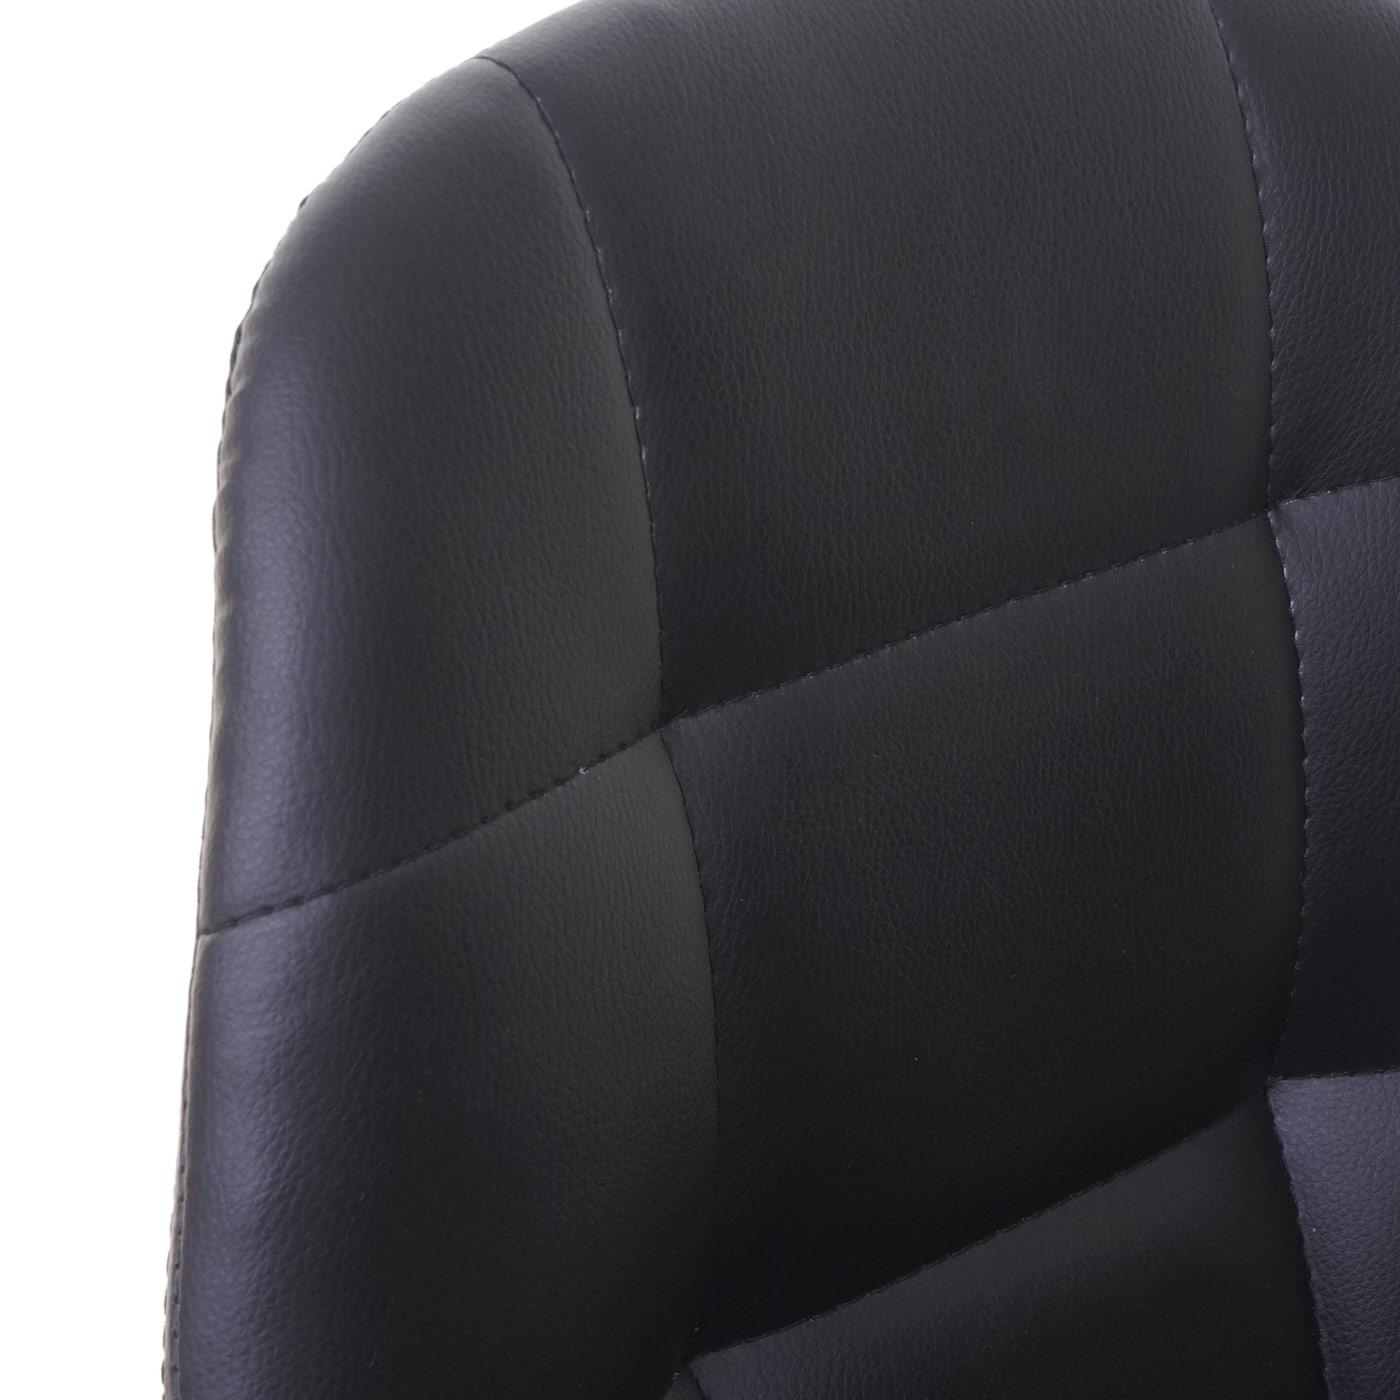 Barhocker HWC-A67 Details